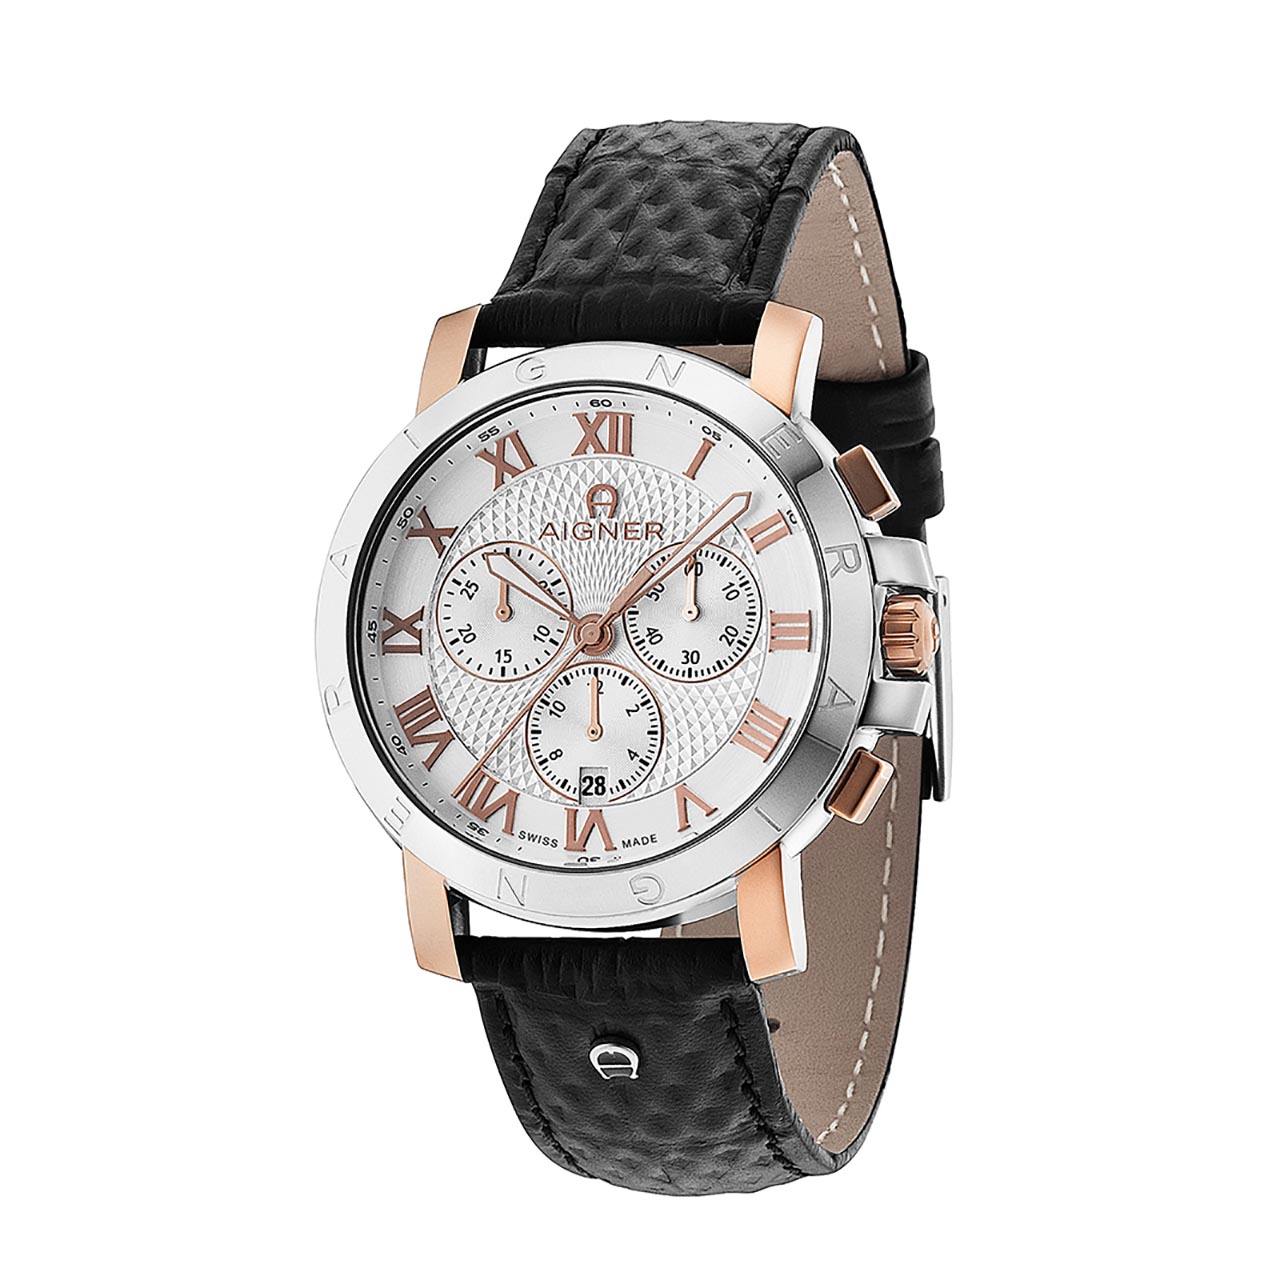 ساعت مچی عقربه ای مردانه اگنر مدل A09504 23